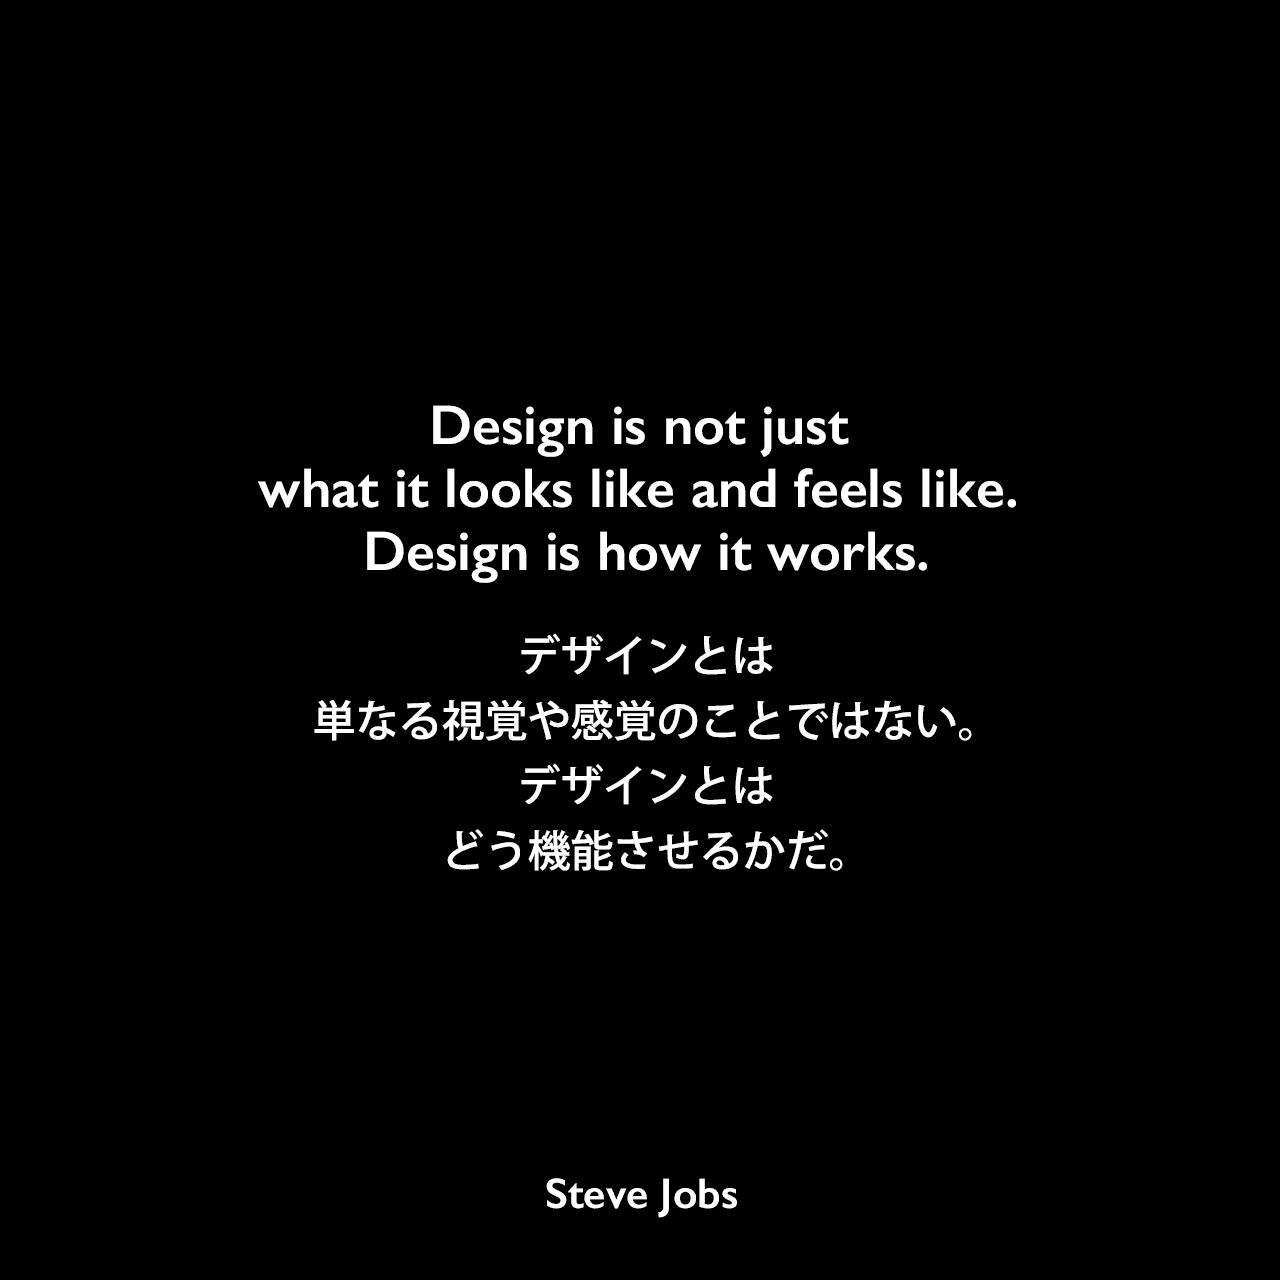 Design is not just what it looks like and feels like. Design is how it works.デザインとは、単なる視覚や感覚のことではない。デザインとは、すなわち、どうやって機能させるかだ。- 2003年11月30日 The New York Times MagazineよりSteve Jobs